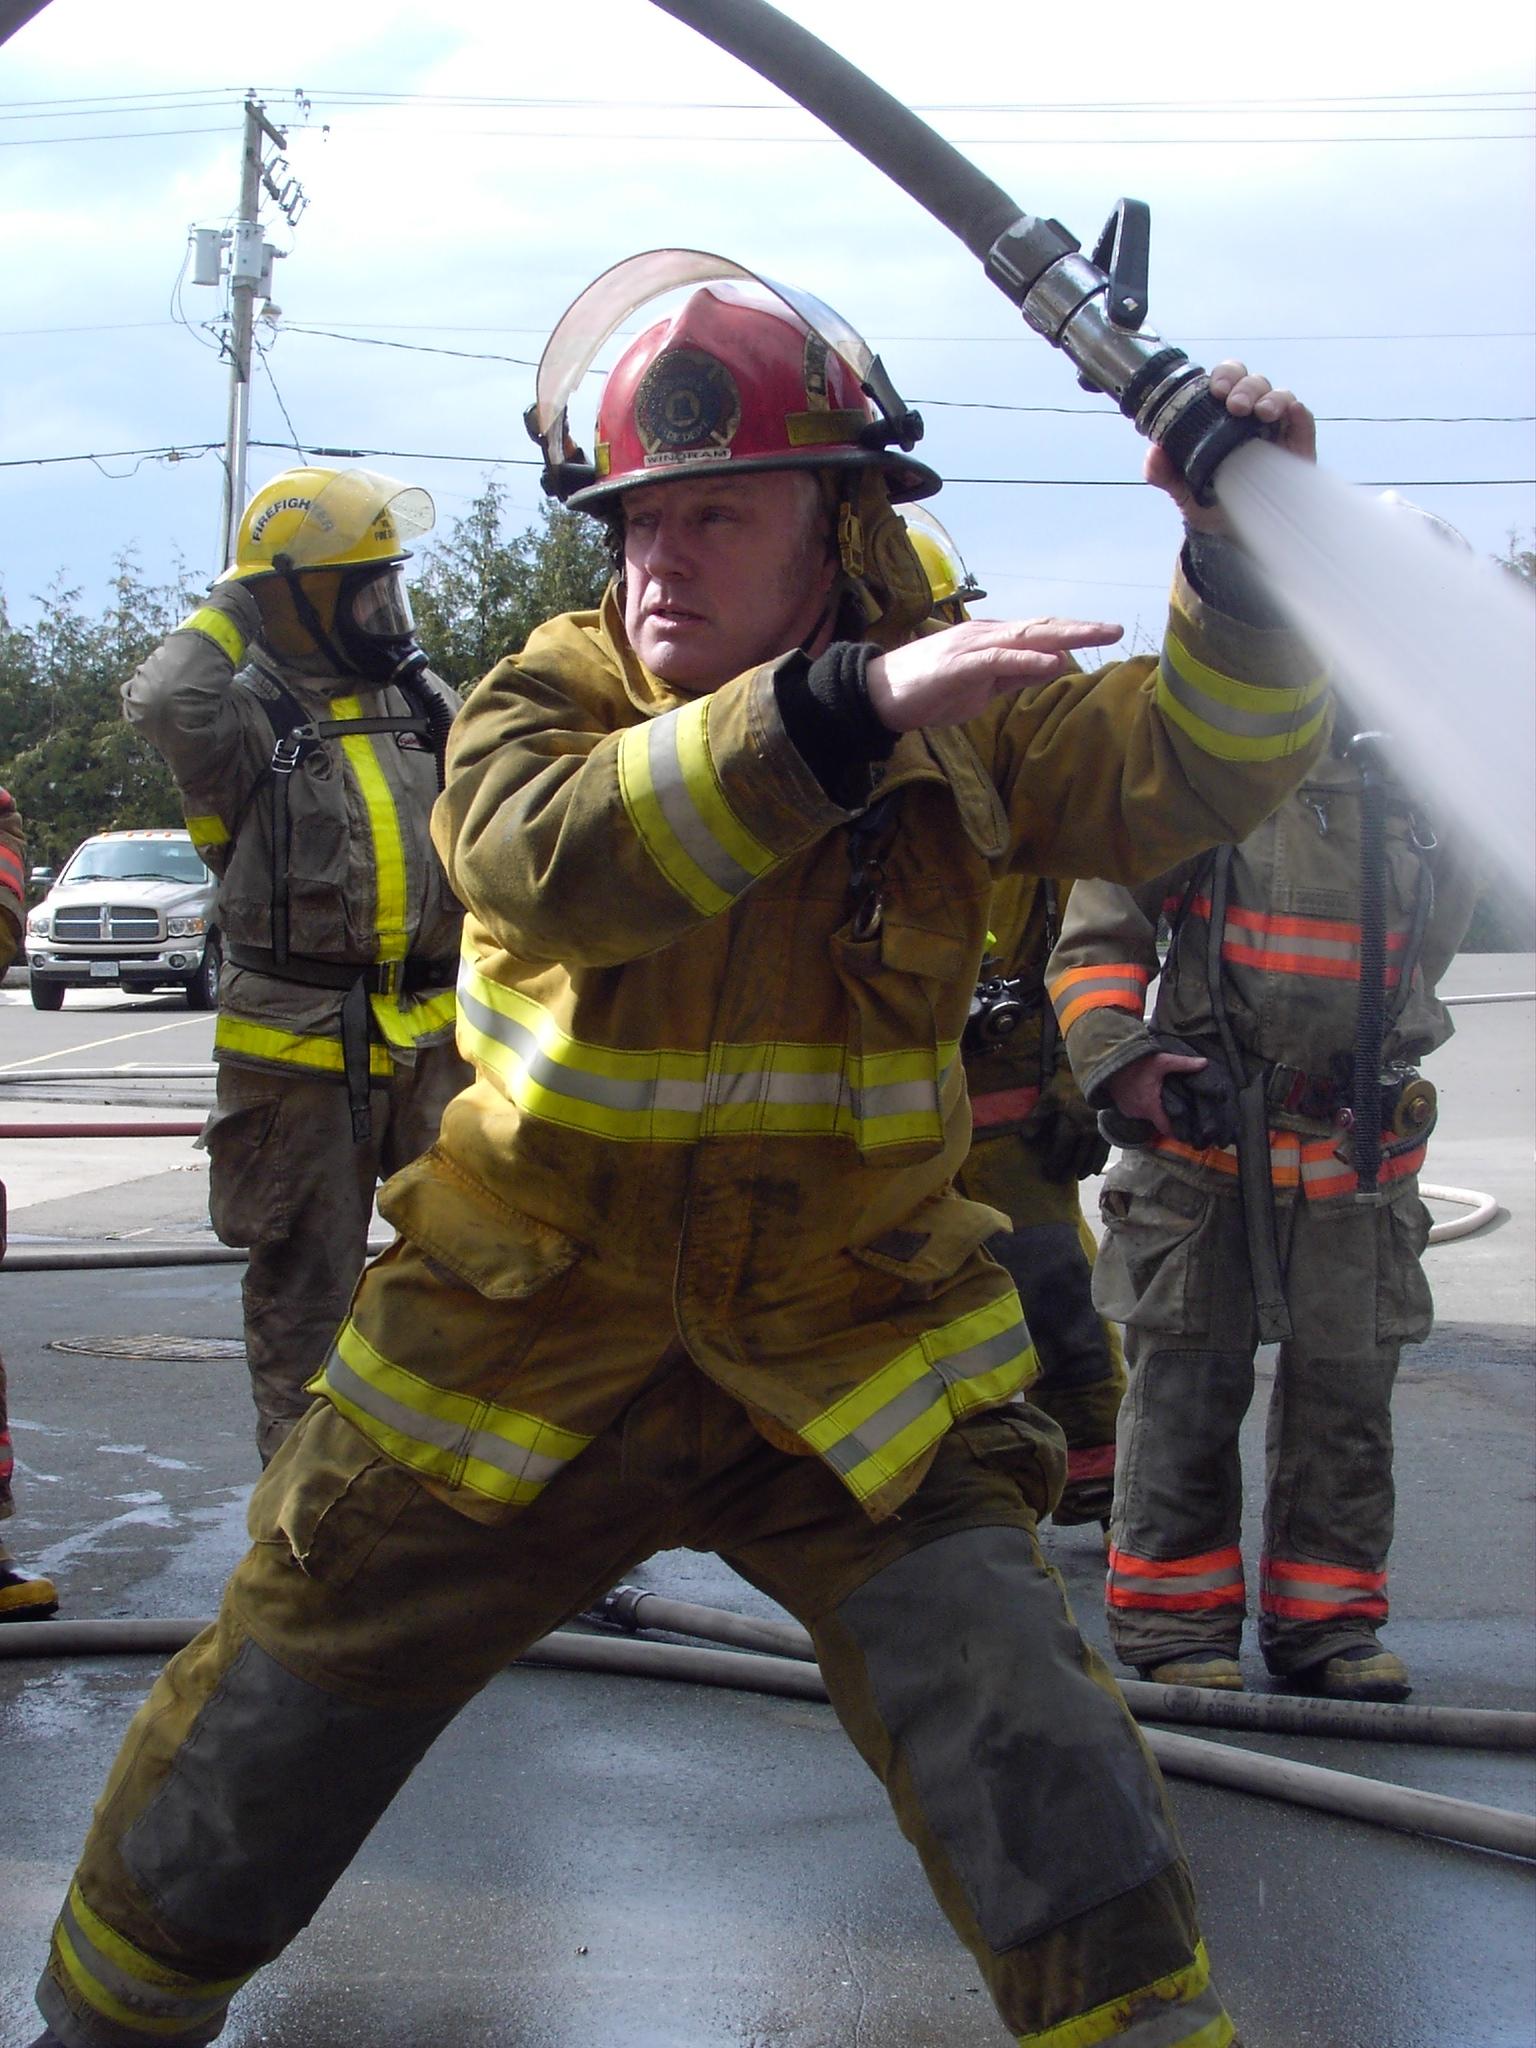 Captain Windram demonstrating some advanced hose handling!